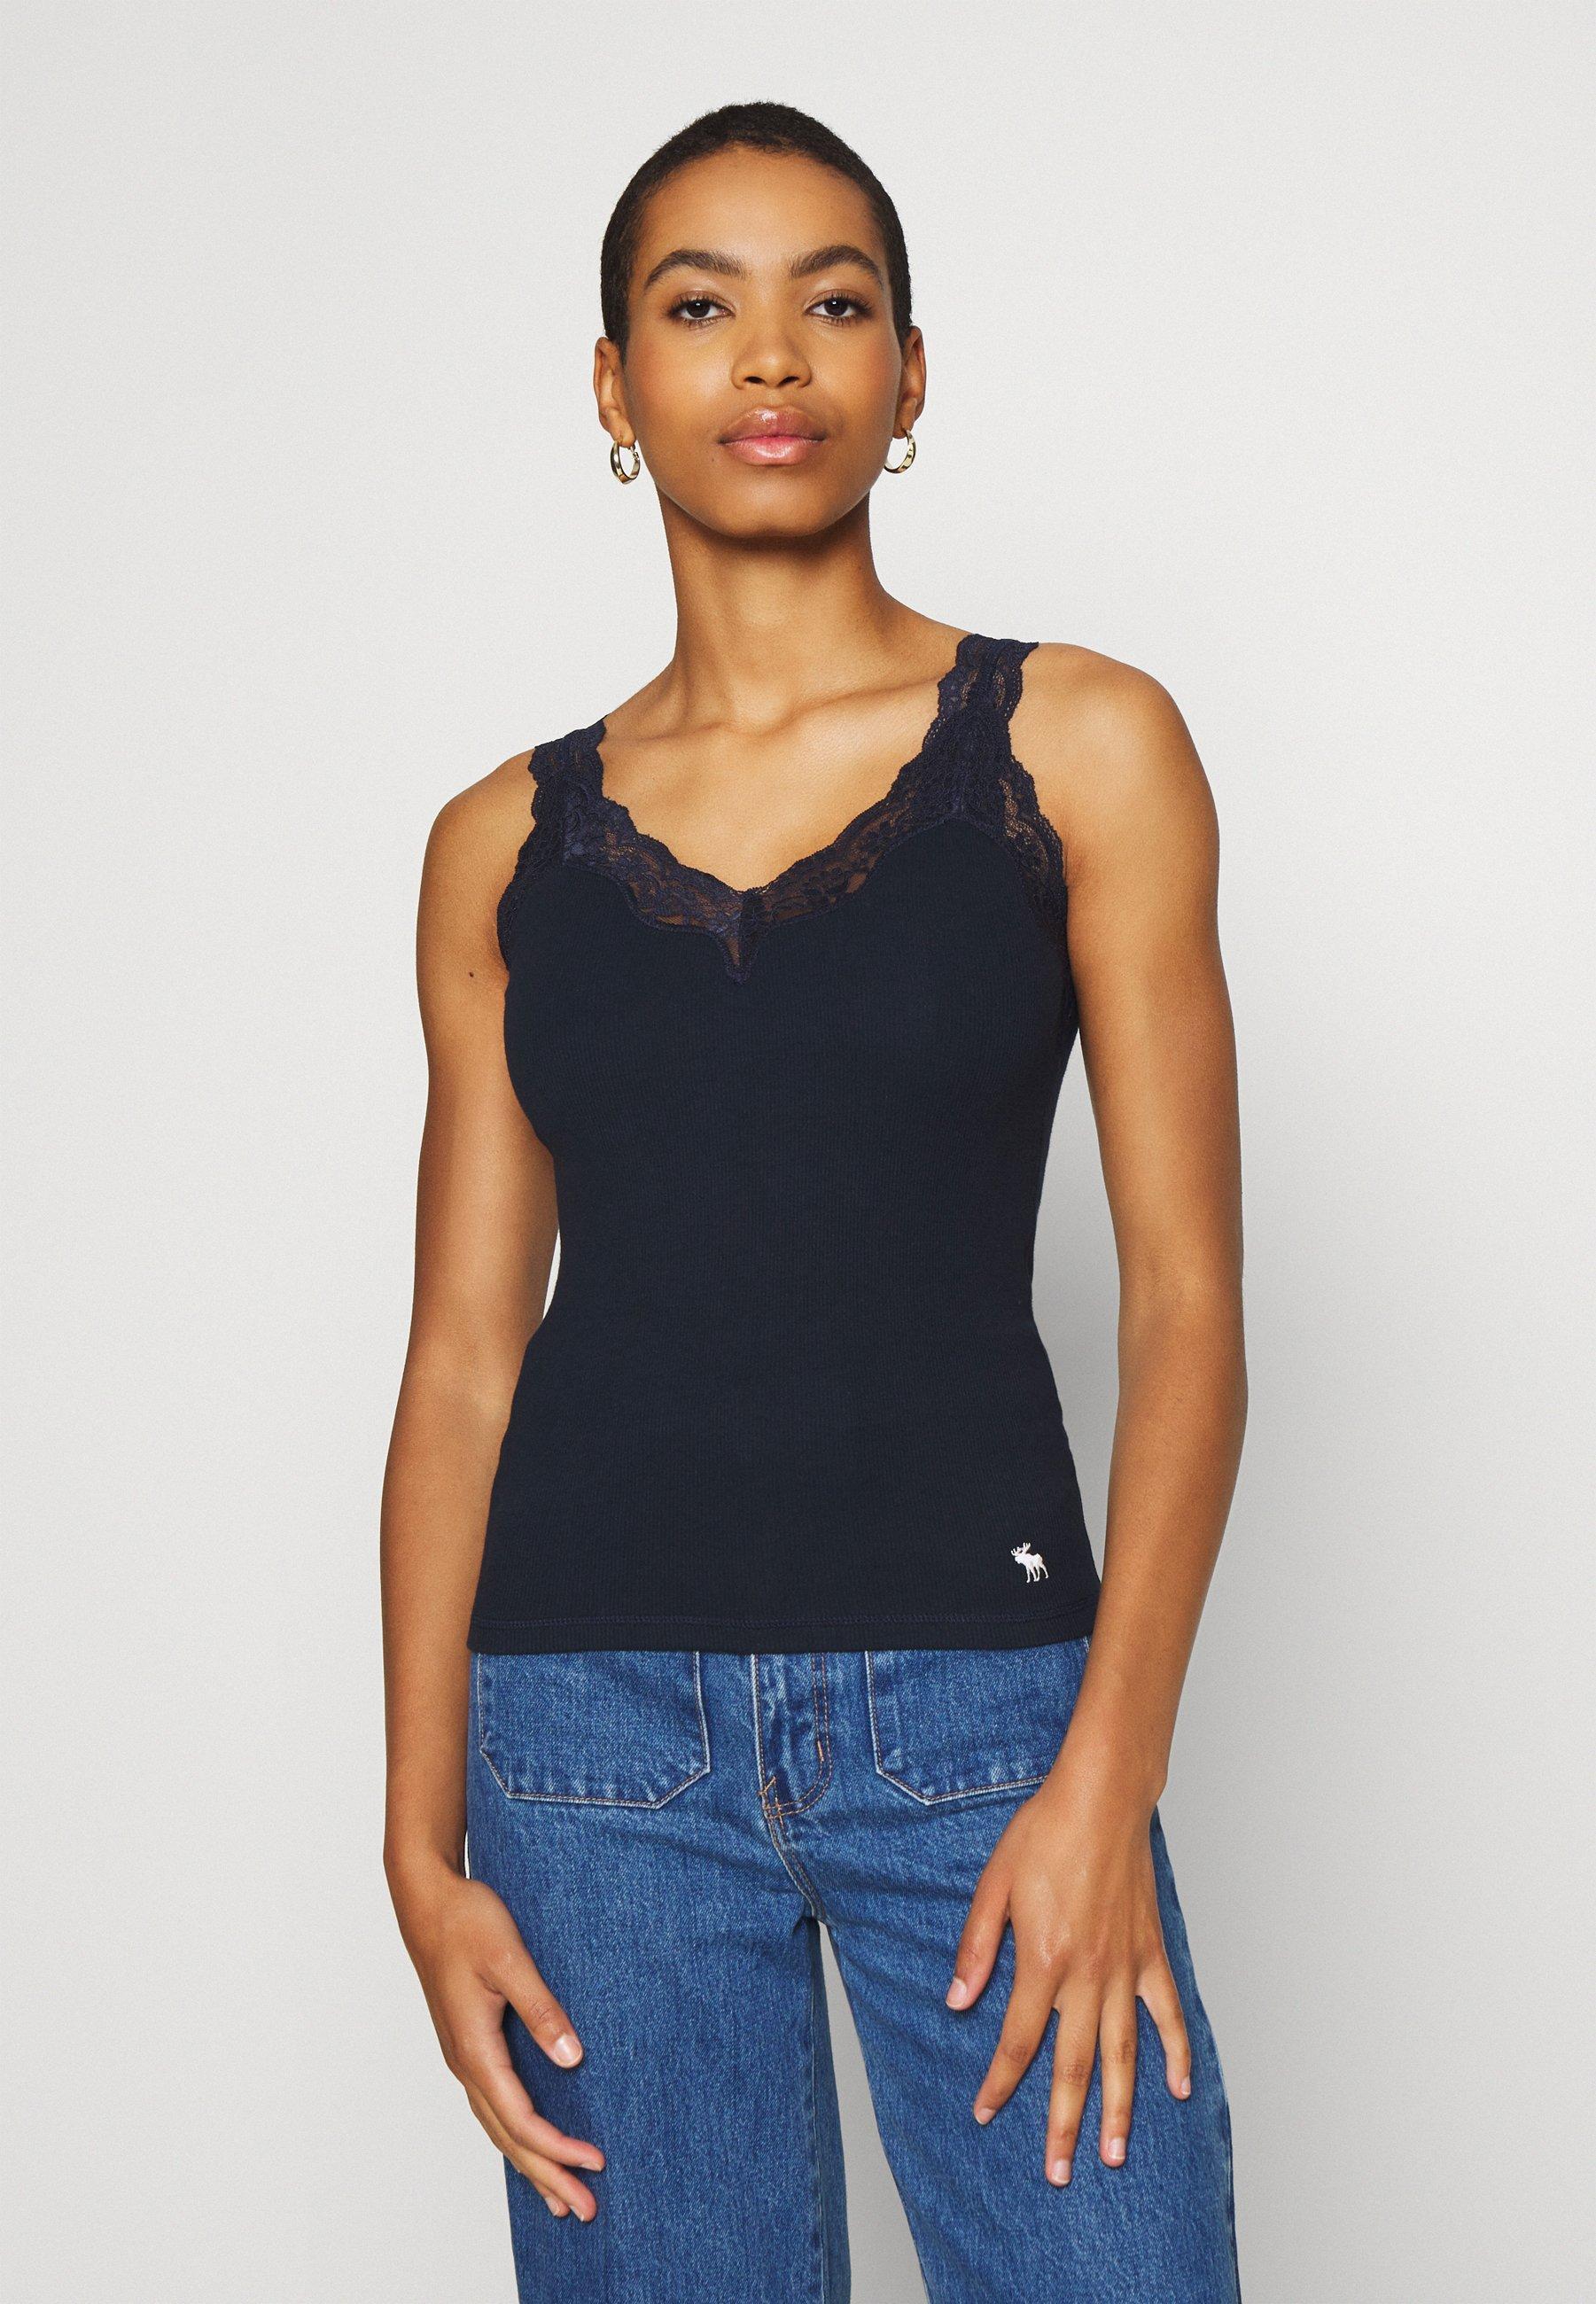 Abercrombie & Fitch BARE CAMI 3 PACK - Top - black/white/navy - Abbigliamento da donna Sbrigati